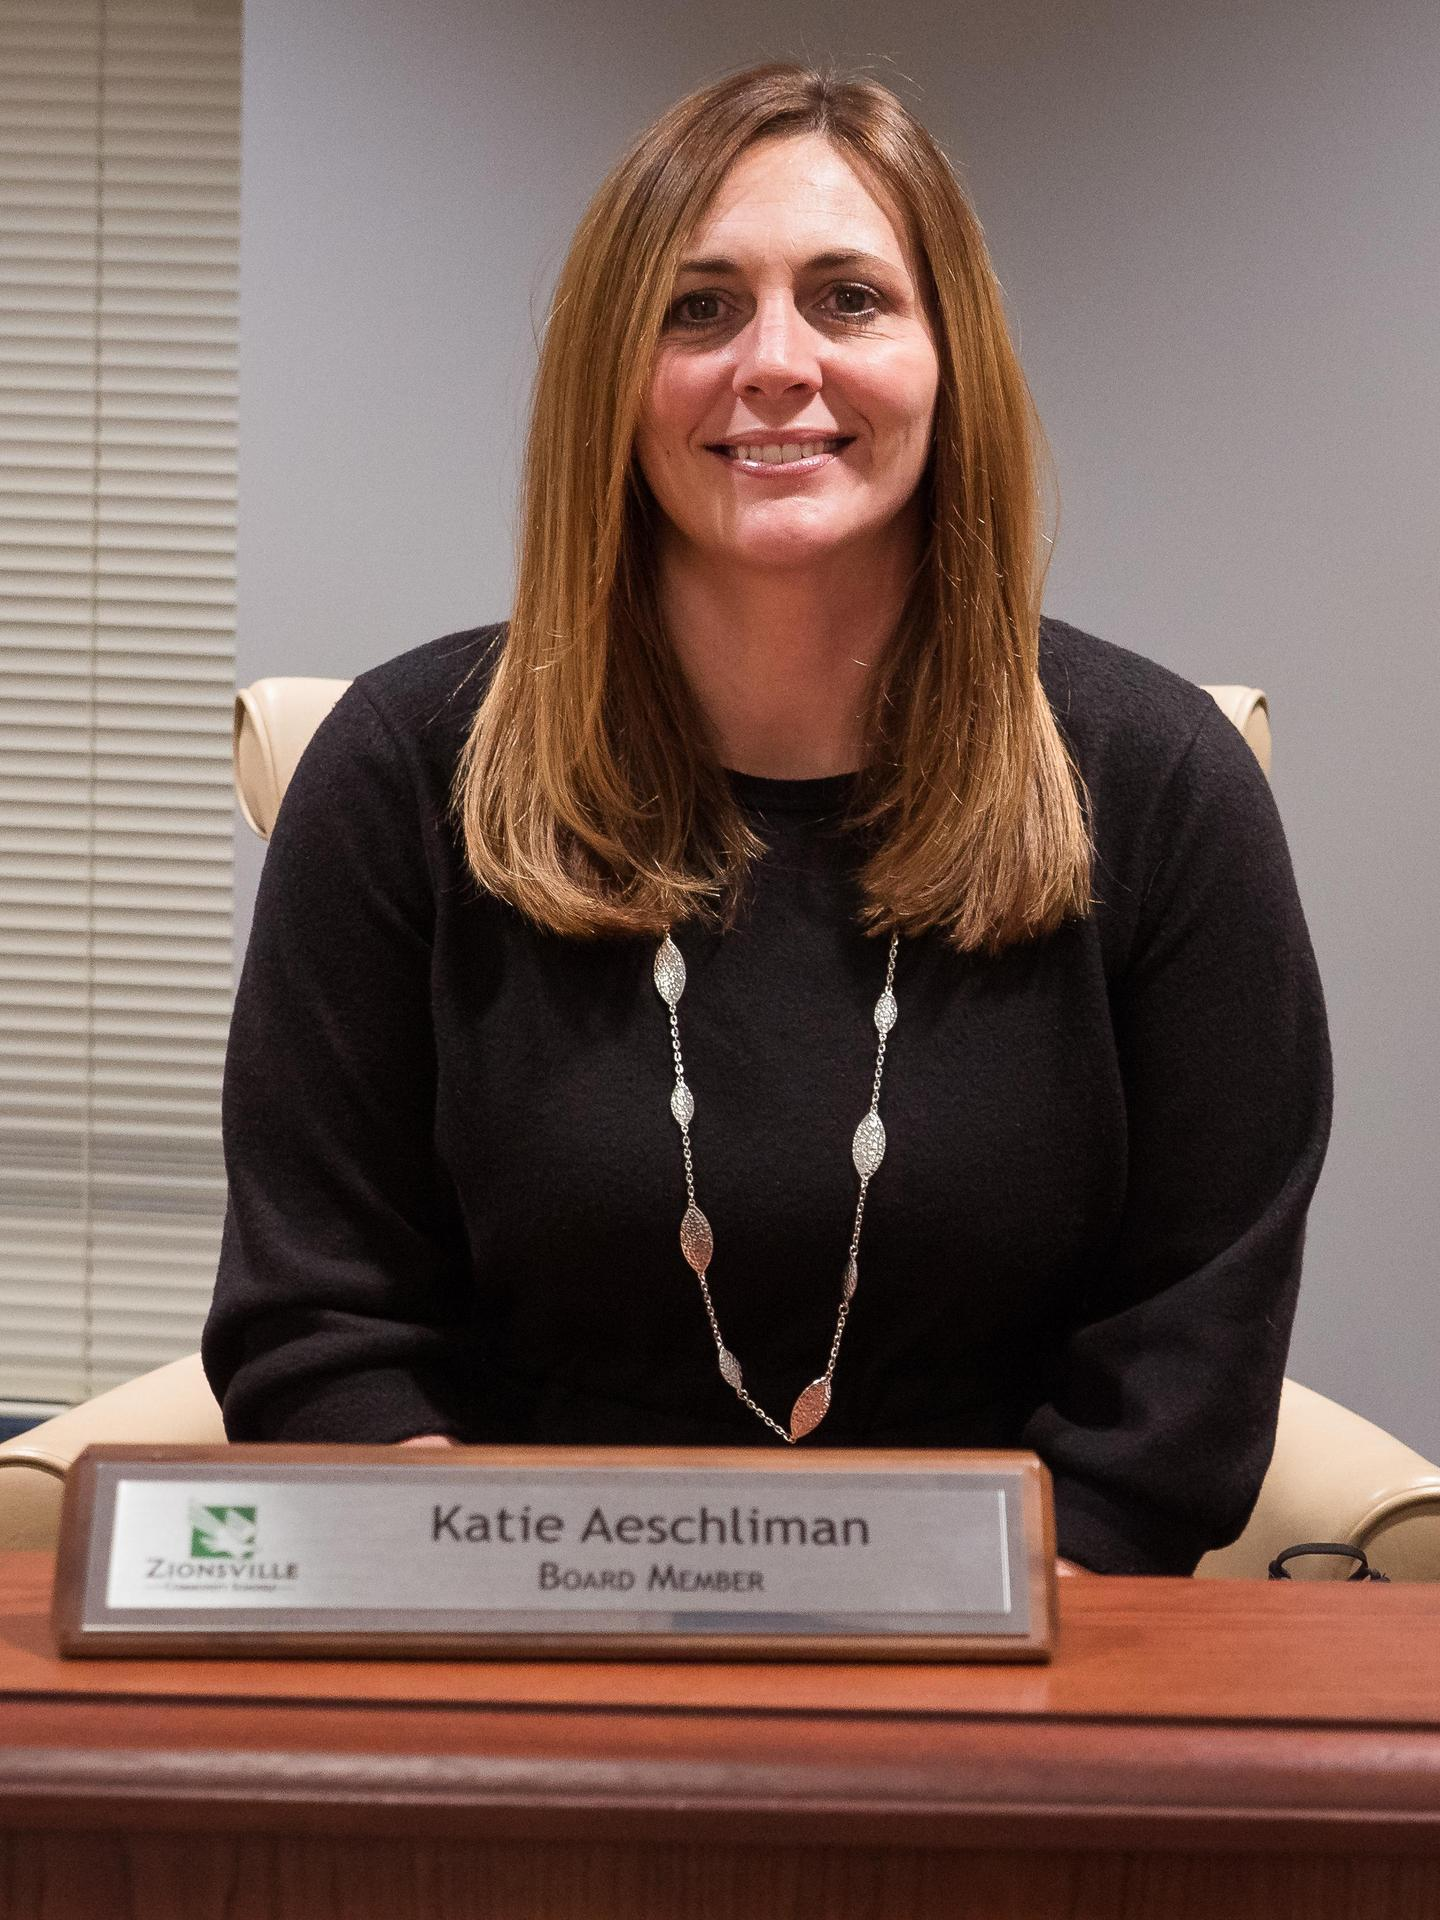 Mrs. Katie Aeschliman